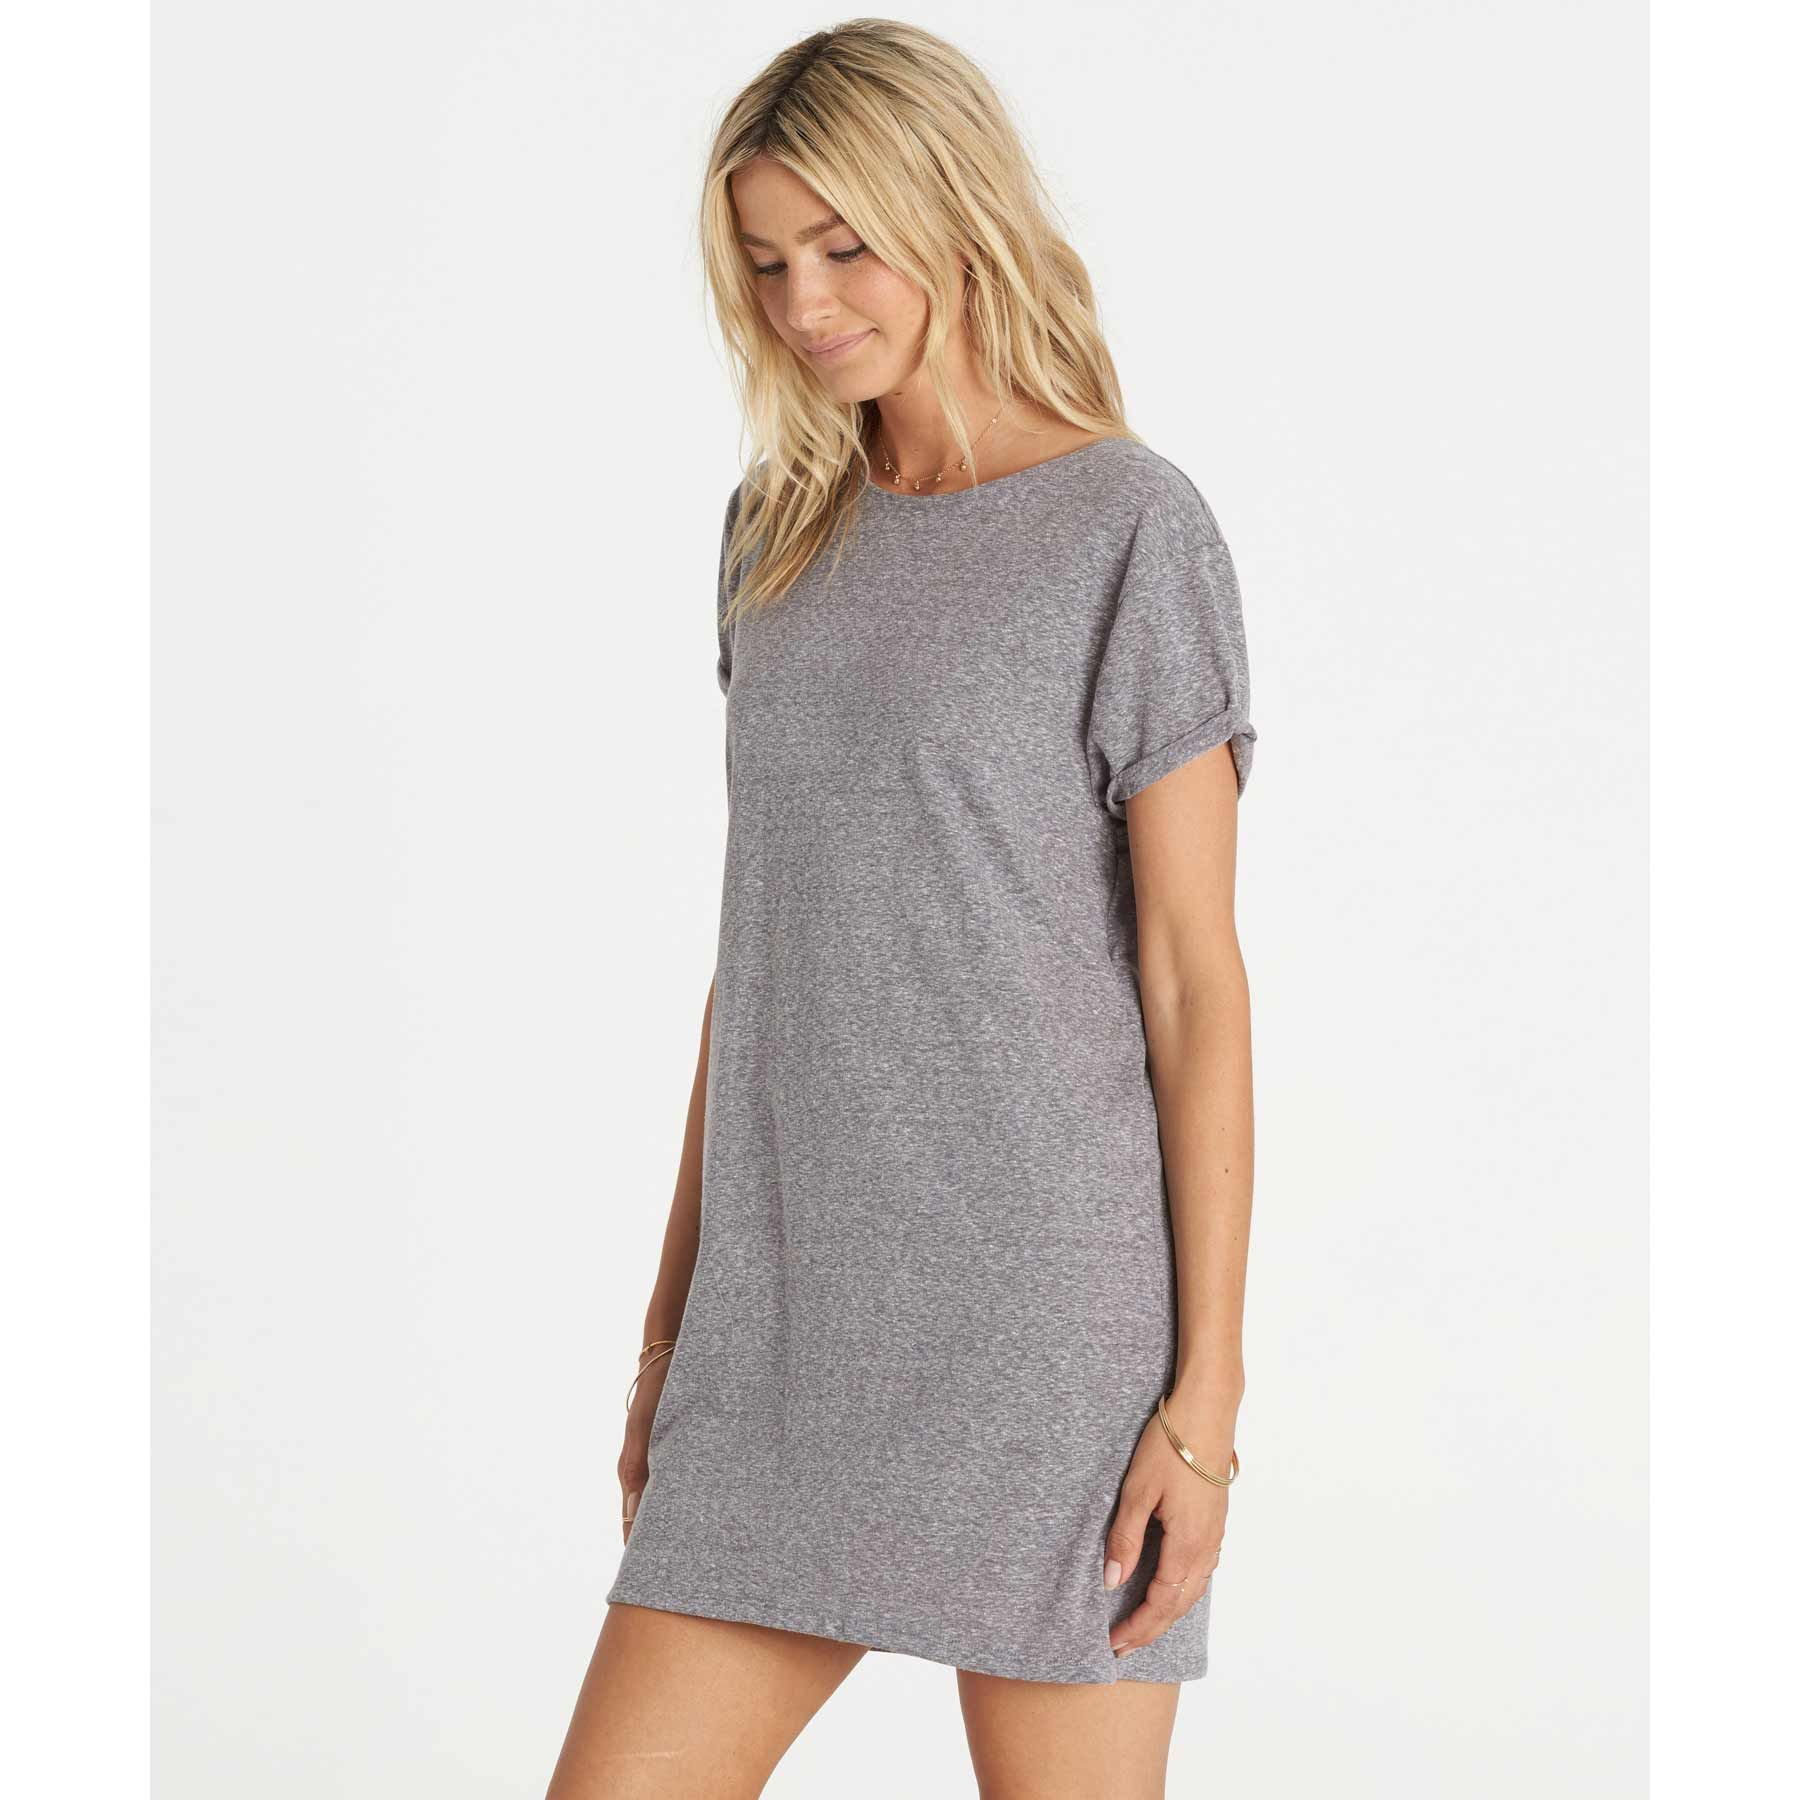 Billabong clothes for womens